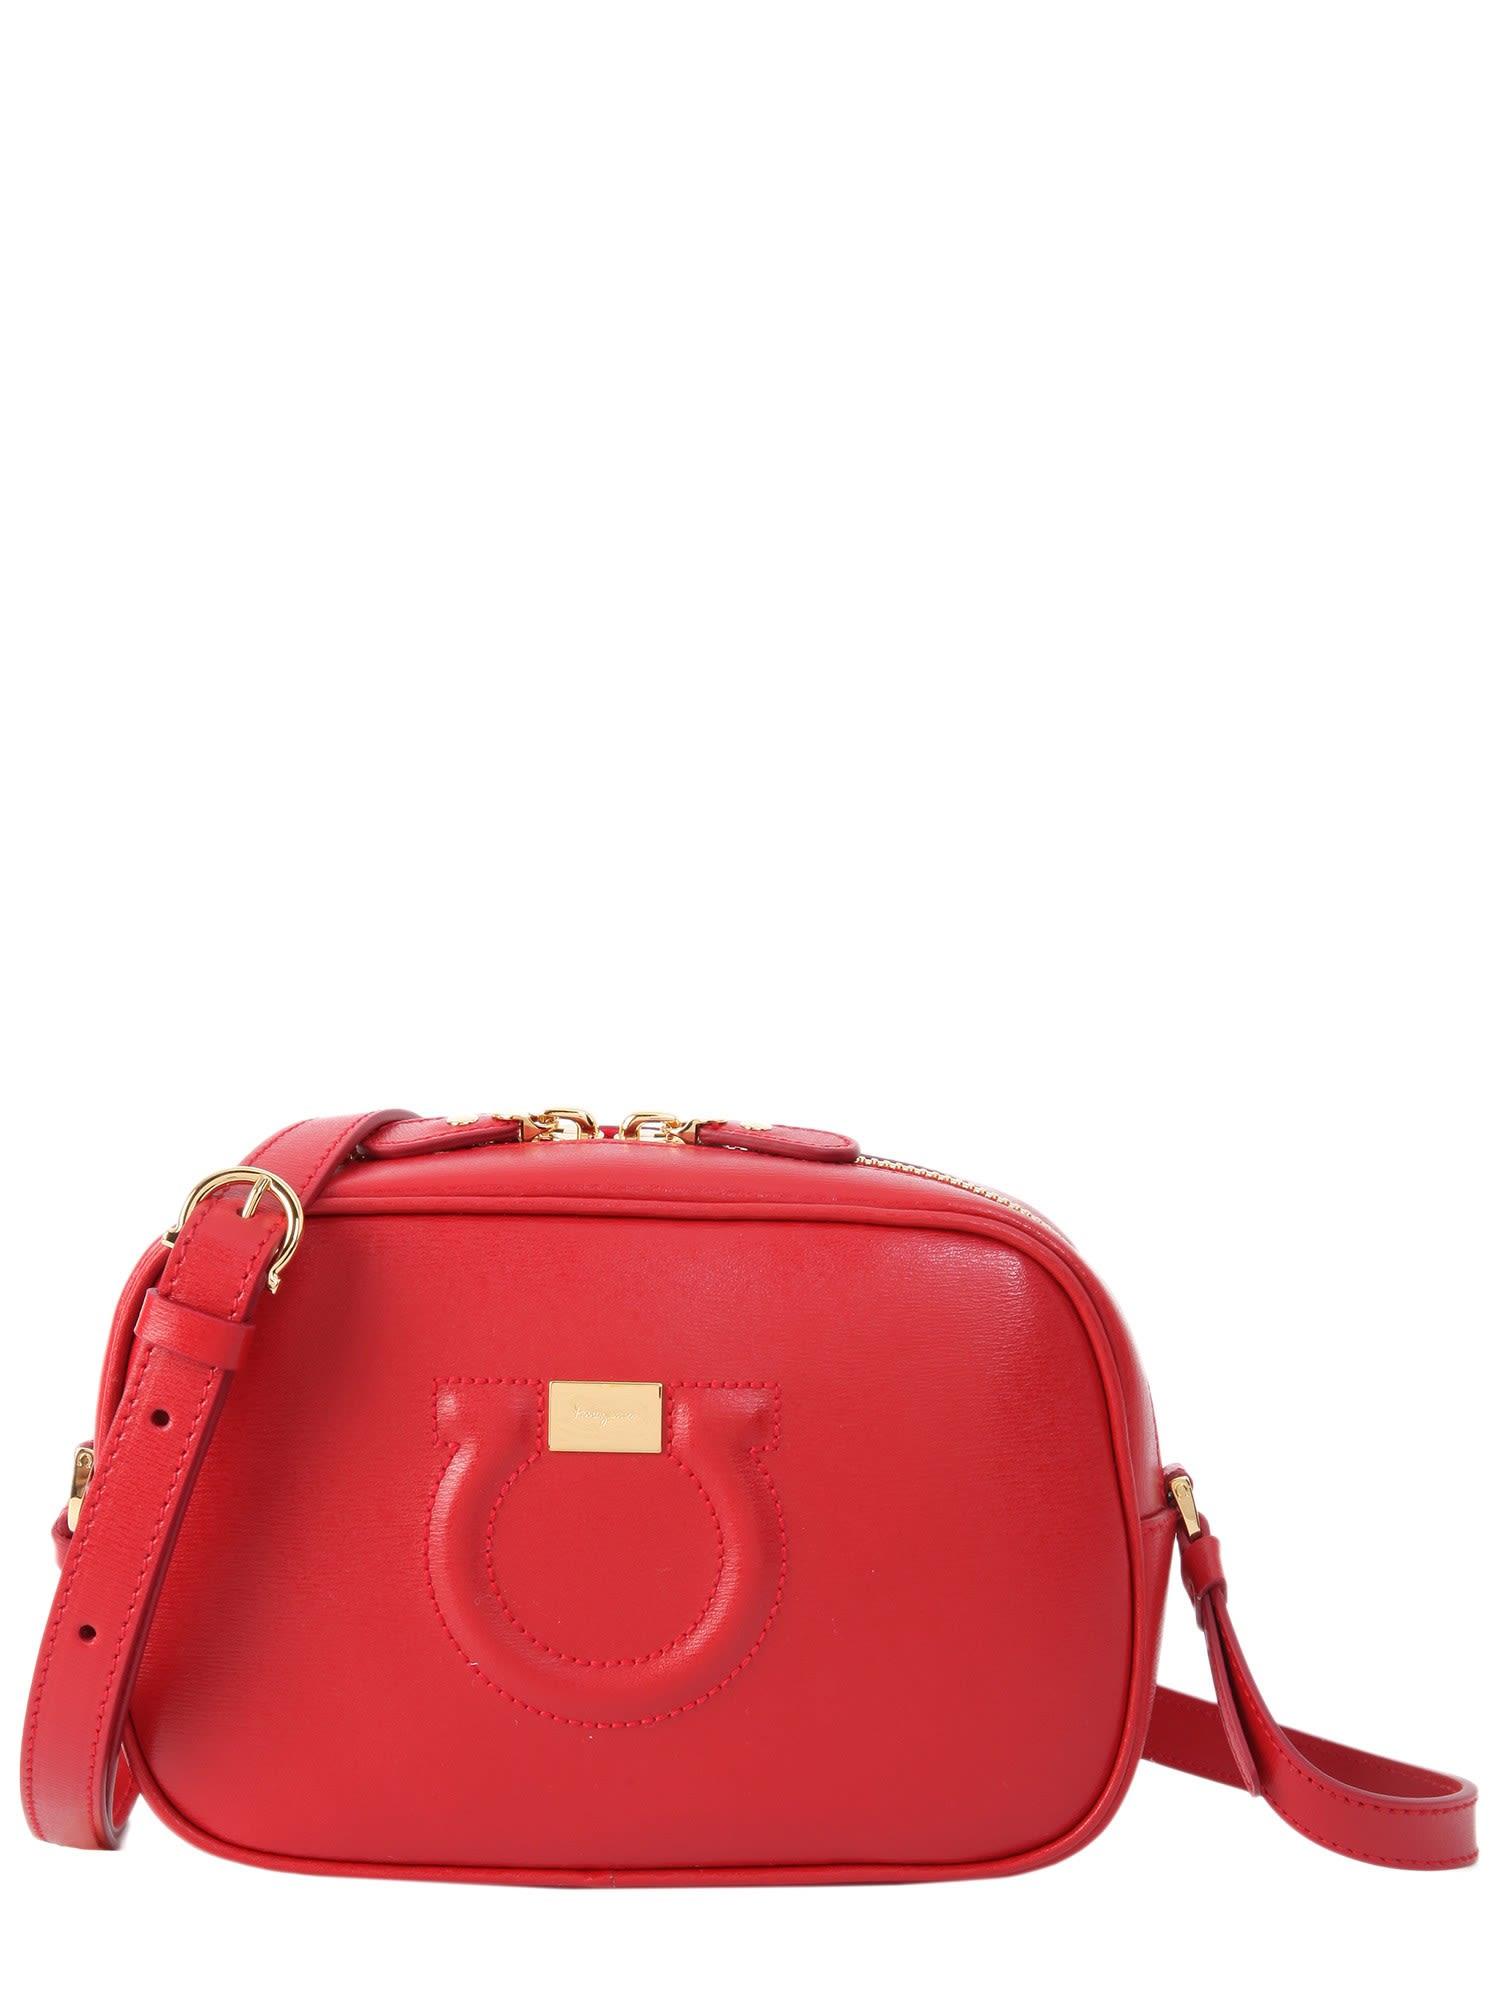 da0e13137a Salvatore Ferragamo Gancini Camera Bag In Rosso